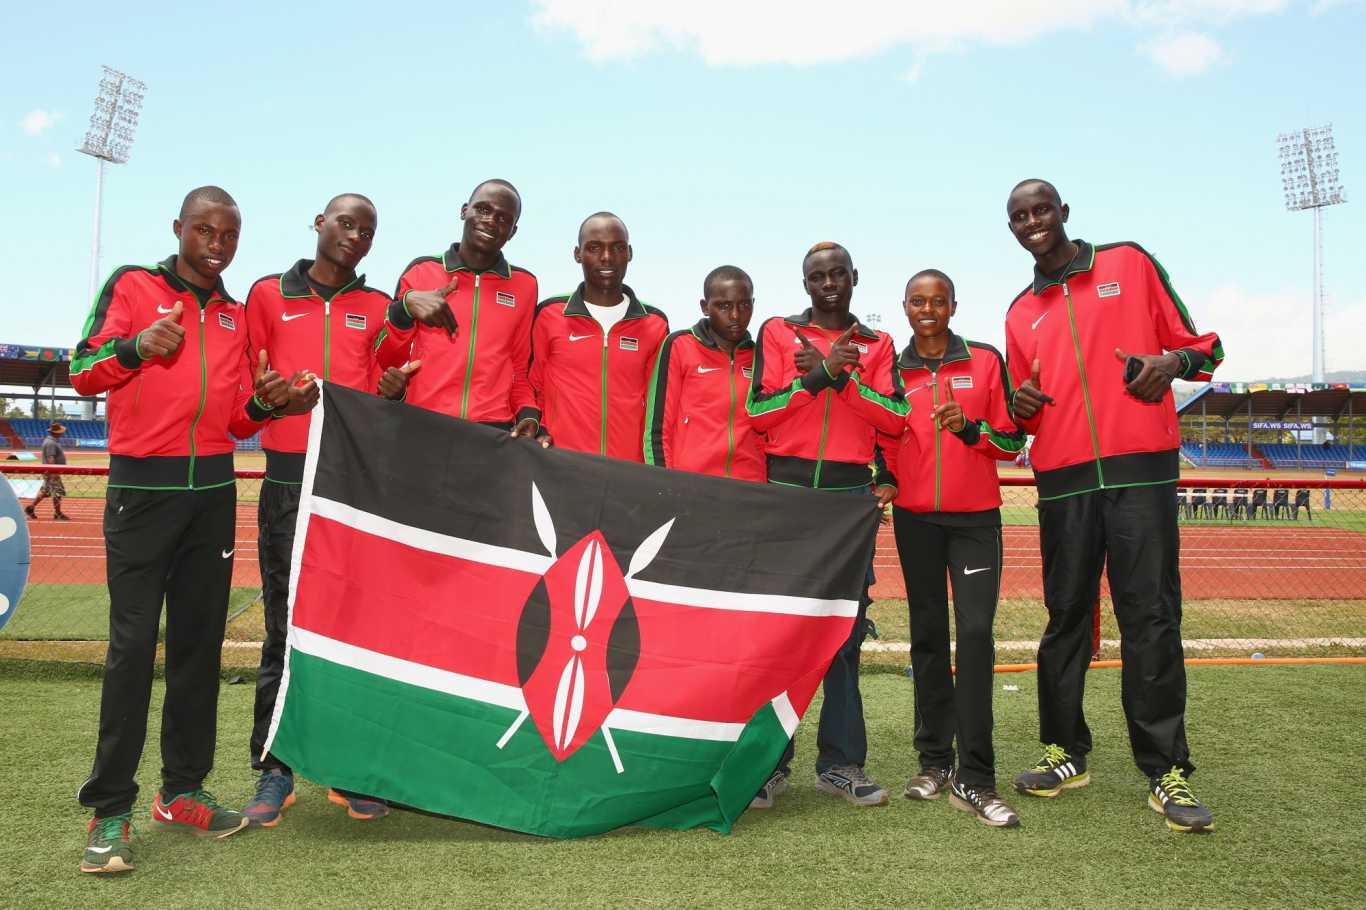 22bet promo code kenya